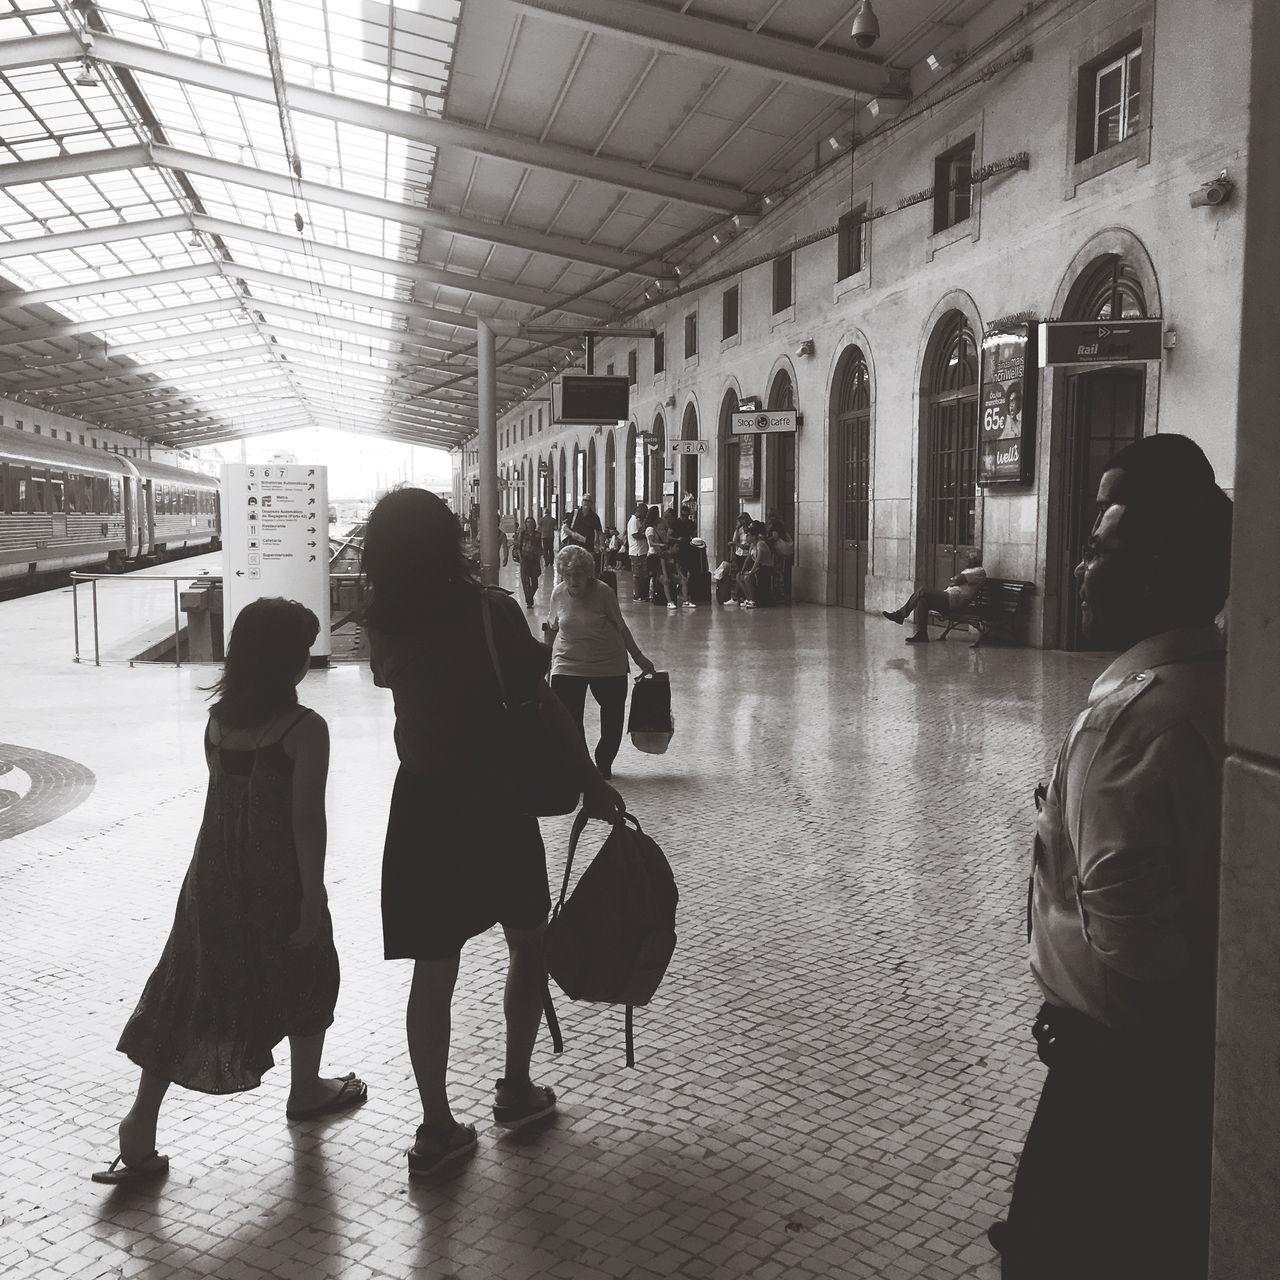 Corre, corre. Temos que apanhar o comboio... Train Portuguese Architecture Train Station In Black And White Urbanphotography Lisbonlovers Black & White Streetphotography Capturing Movement Estação De Santa Apolónia